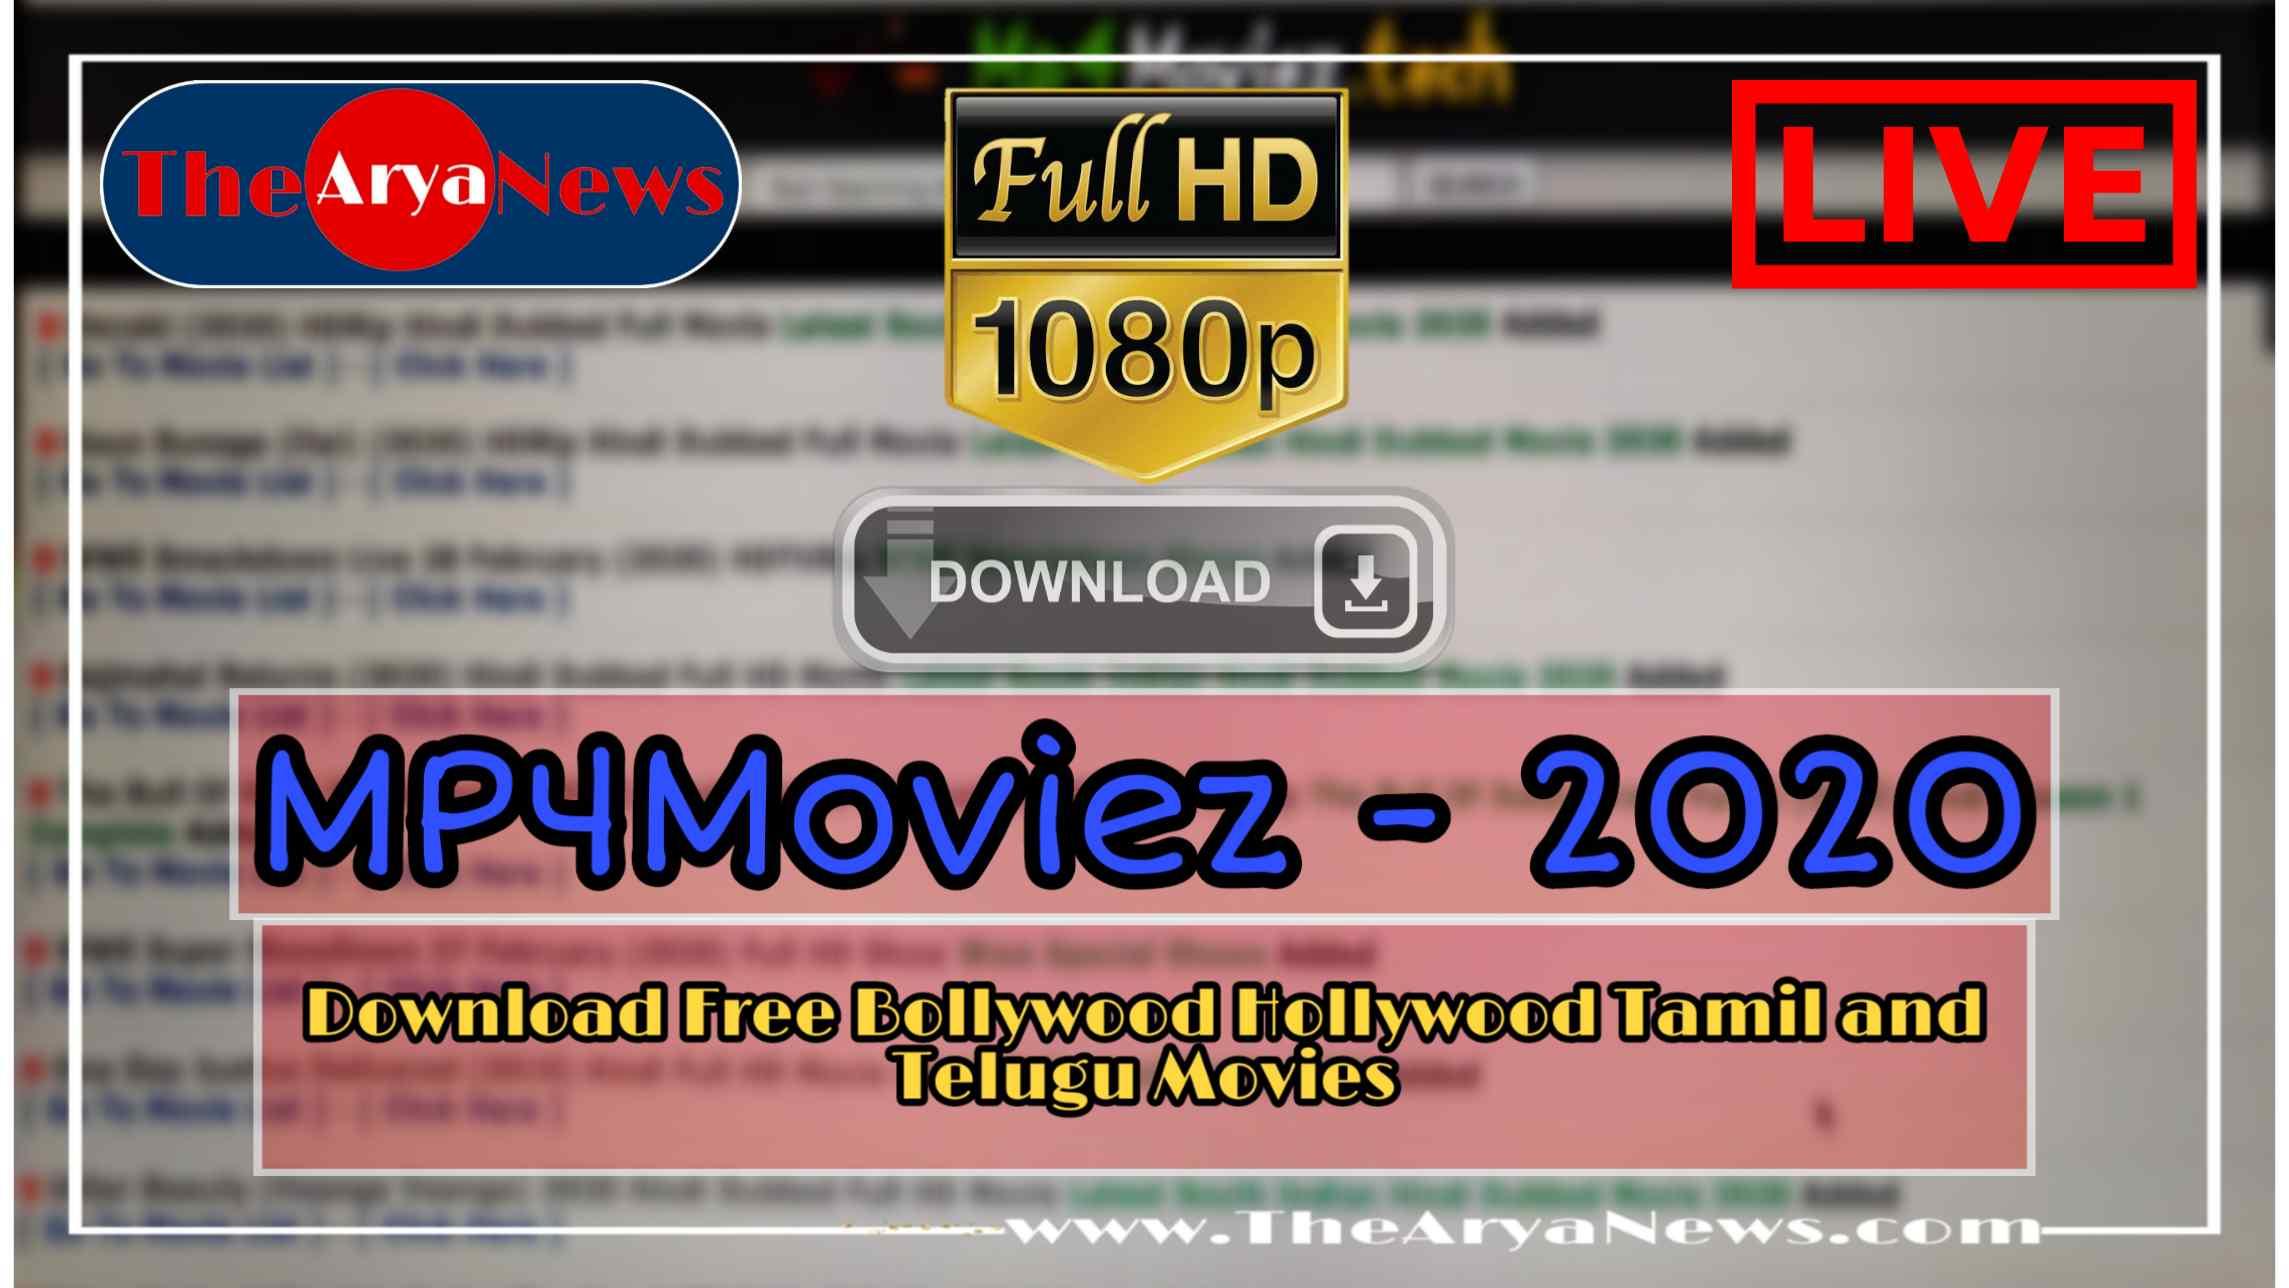 Mp4Moviez » 2020 Bollywood New Movies Download, Hollywood Hindi Dubbed